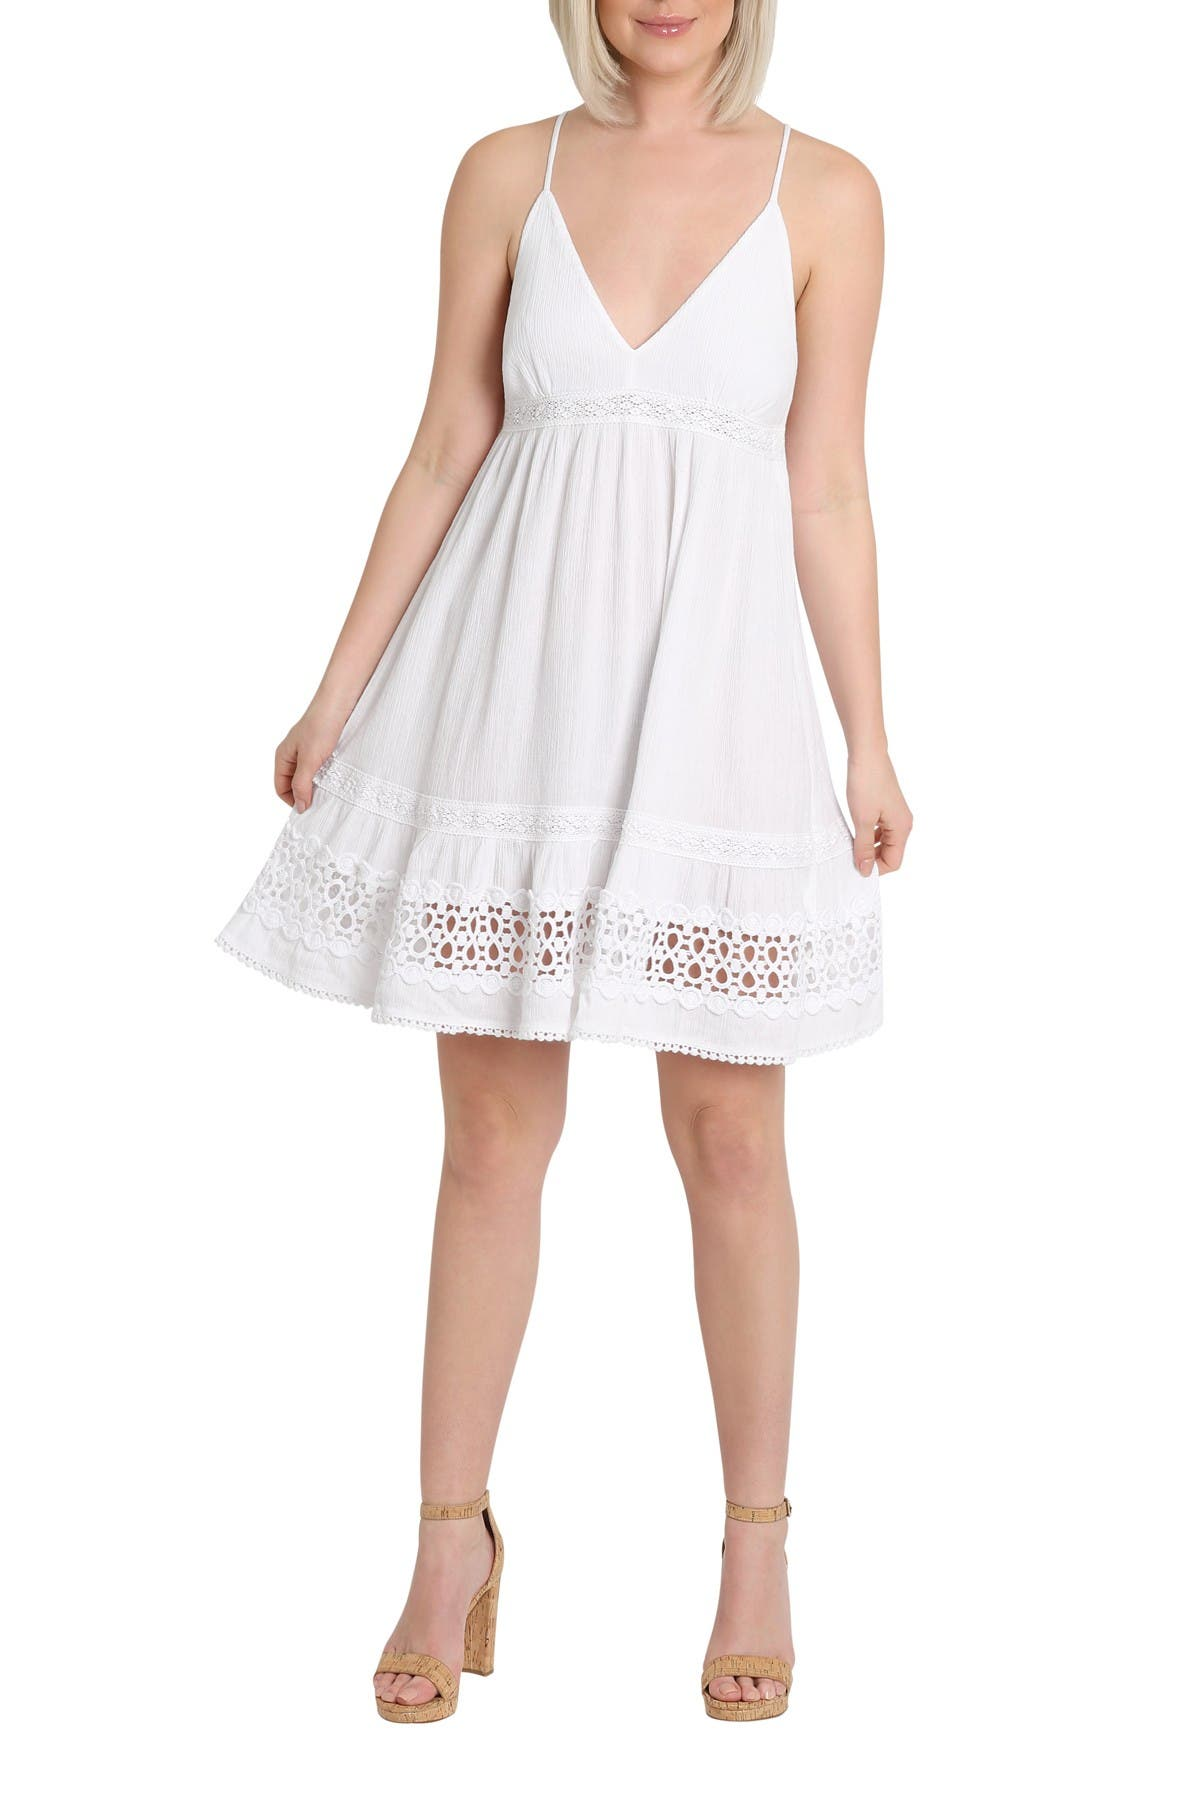 Image of Nanette Lepore Stella Spaghetti Crochet Dress